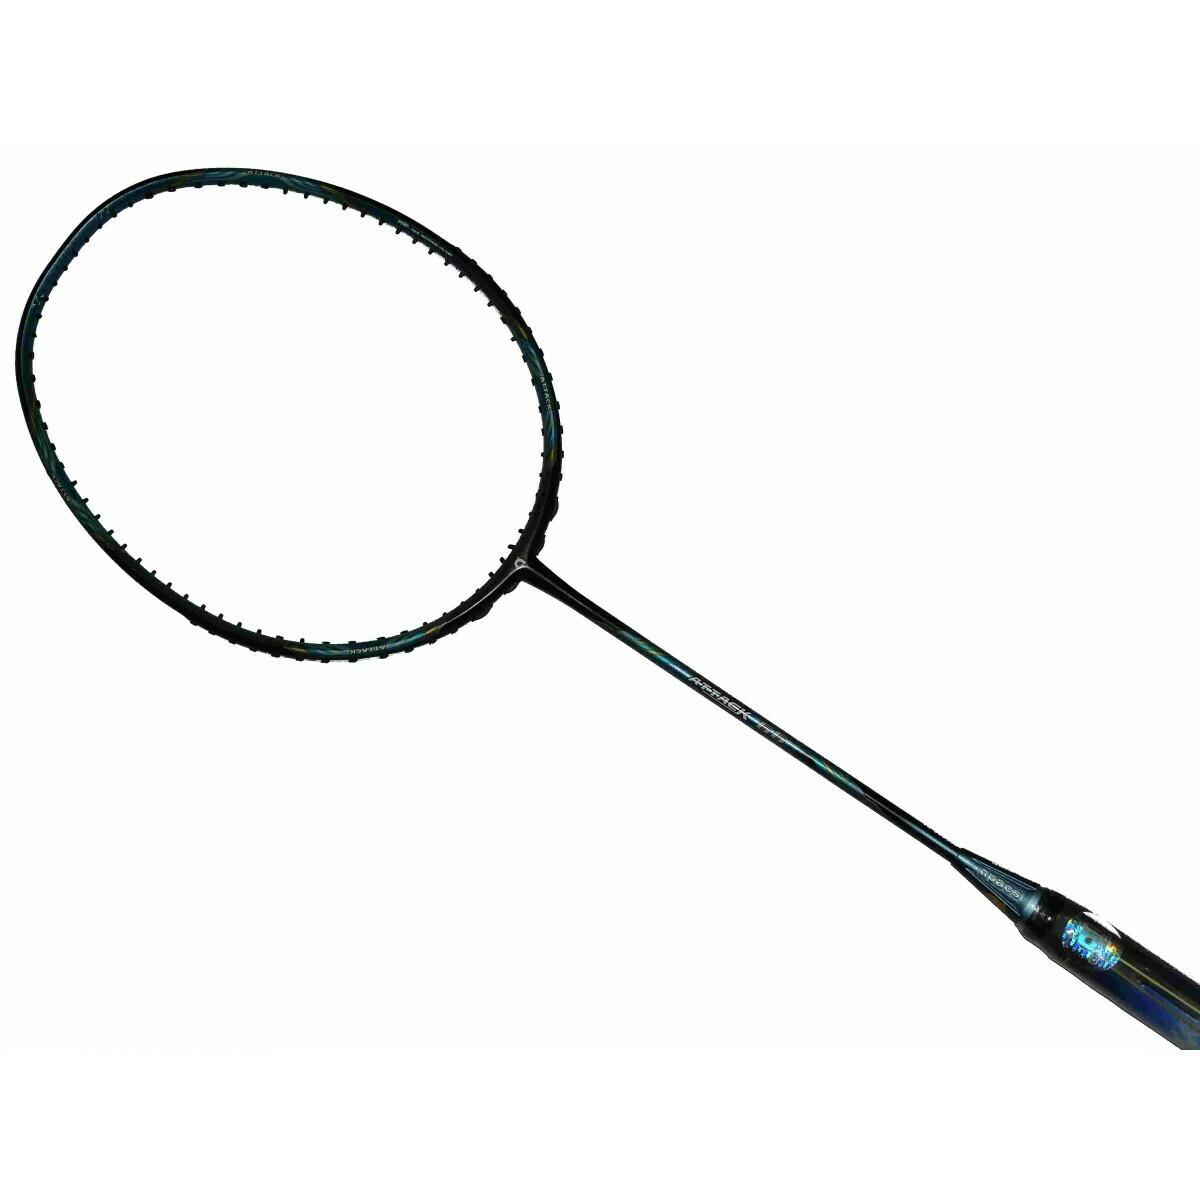 Apacs Attack 66 Black/Blue Badminton Racquet